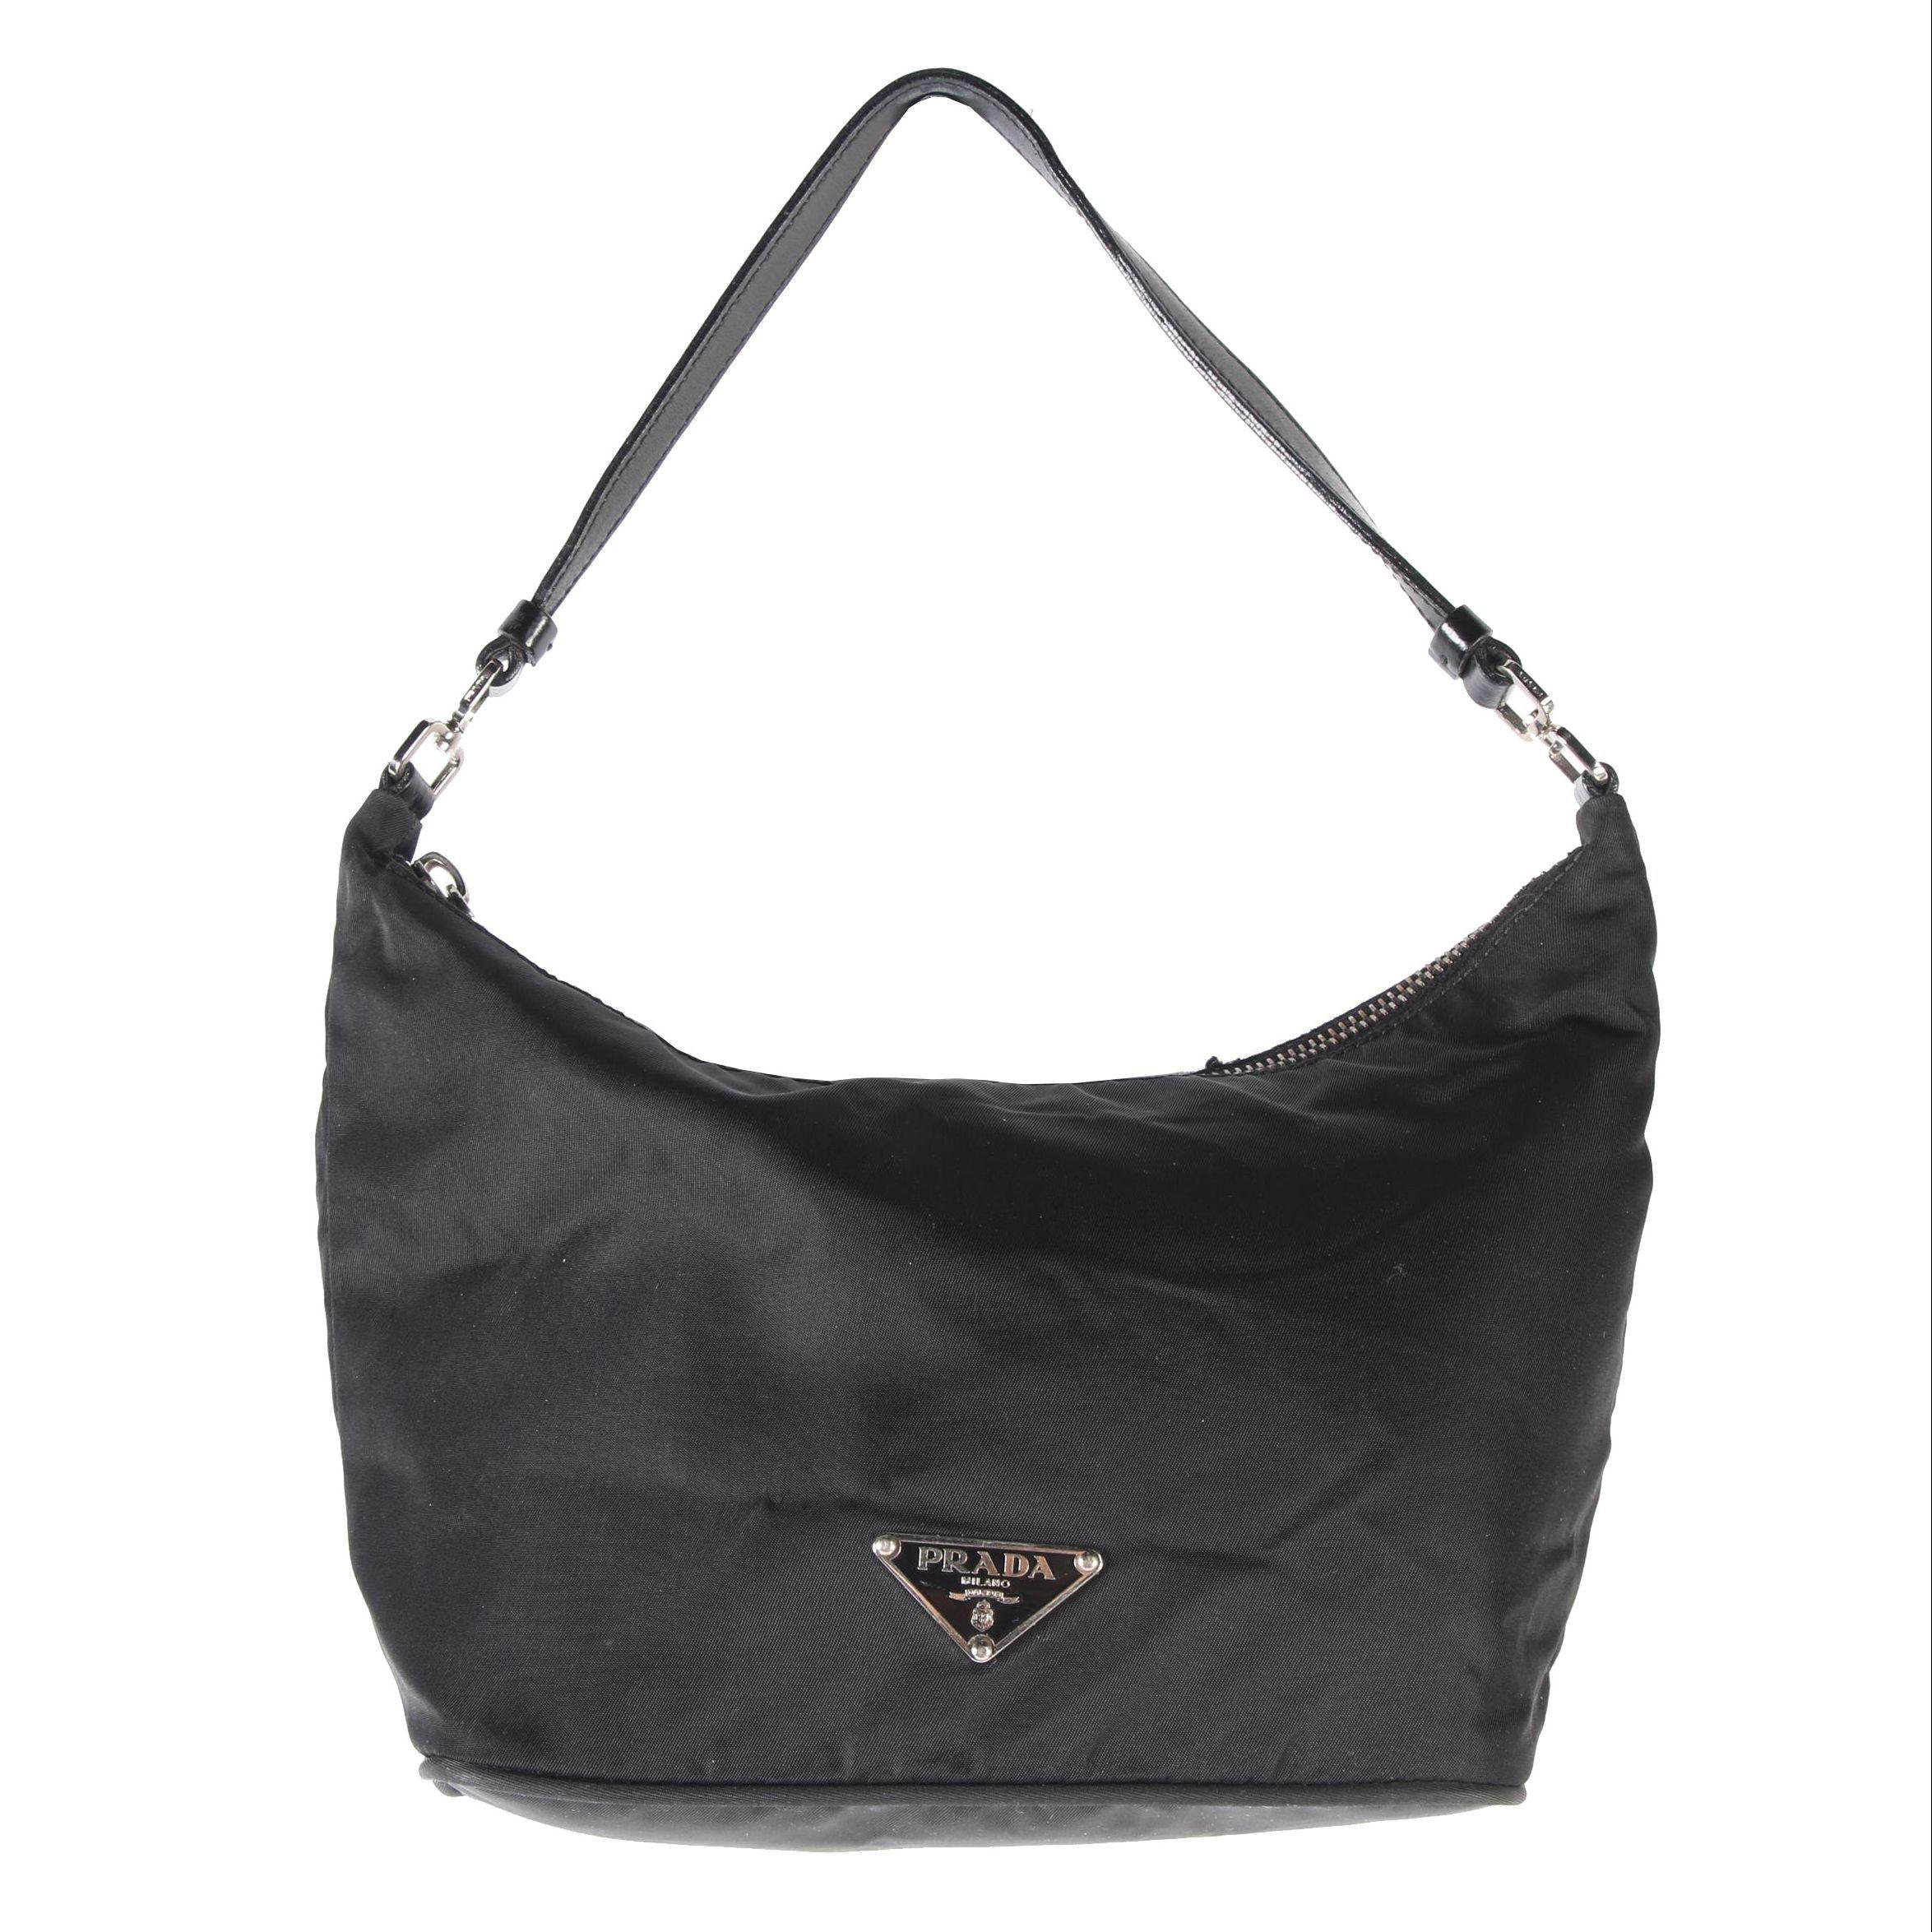 Prada Black Nylon and Leather Demi Sac Bag